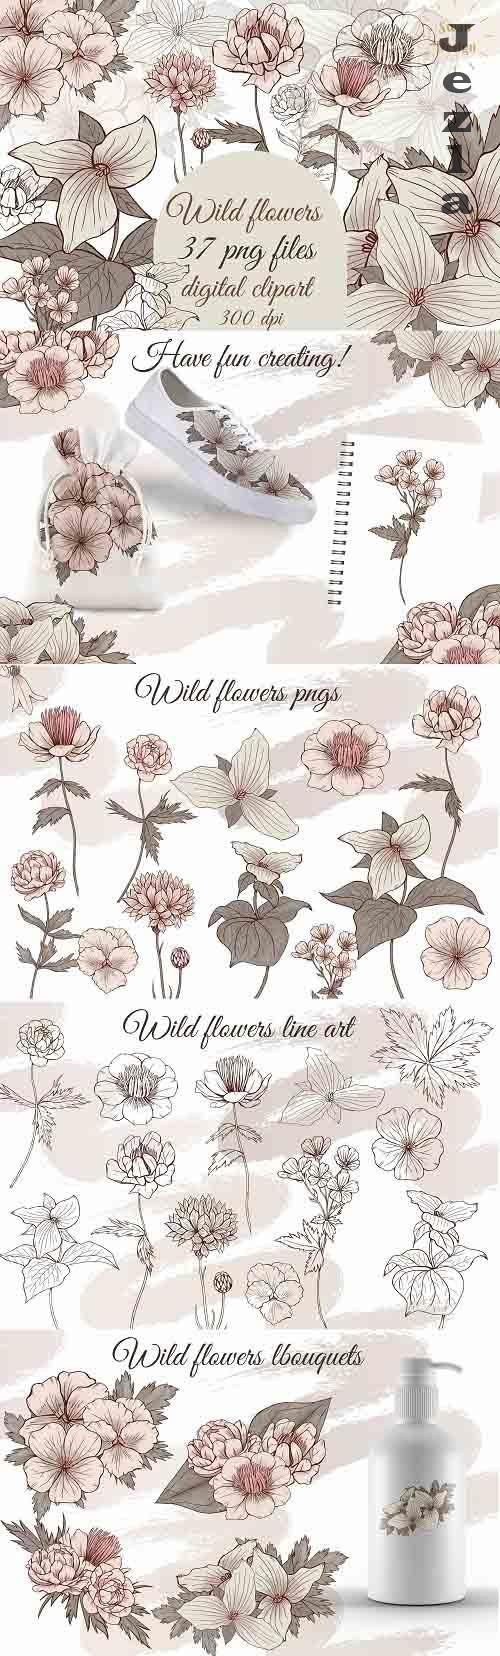 Elegant vintage flowers clipart, line art florals png, beige - 1369098